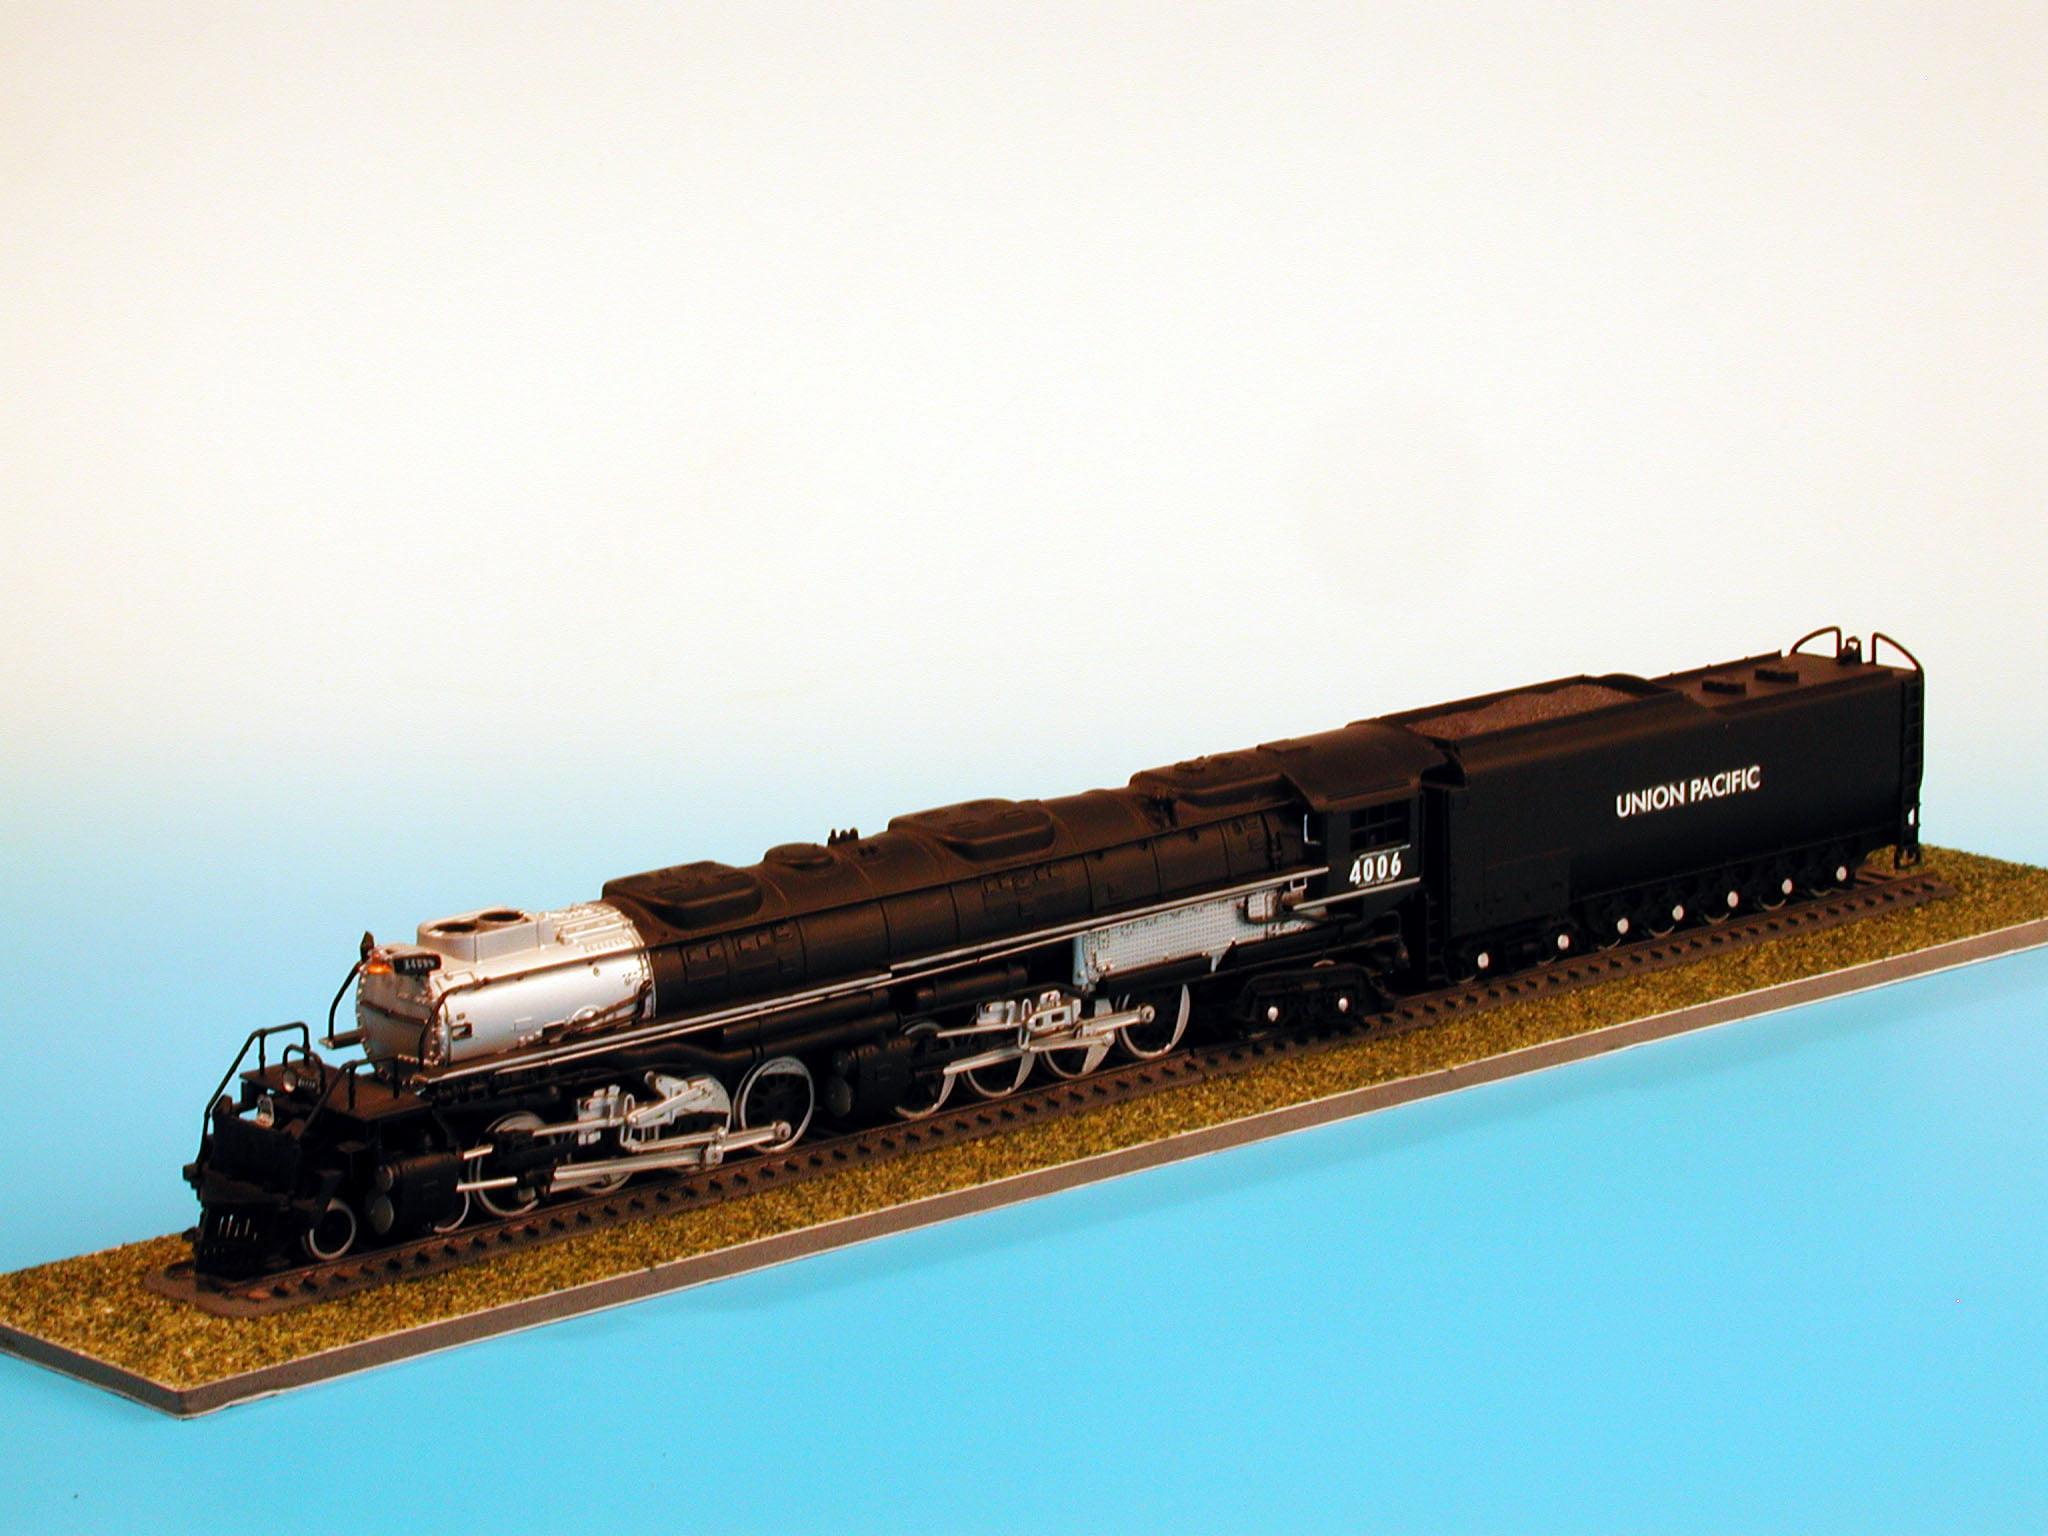 Revell Big Boy Locomotive 1 87th Scale Plastic Model Kit